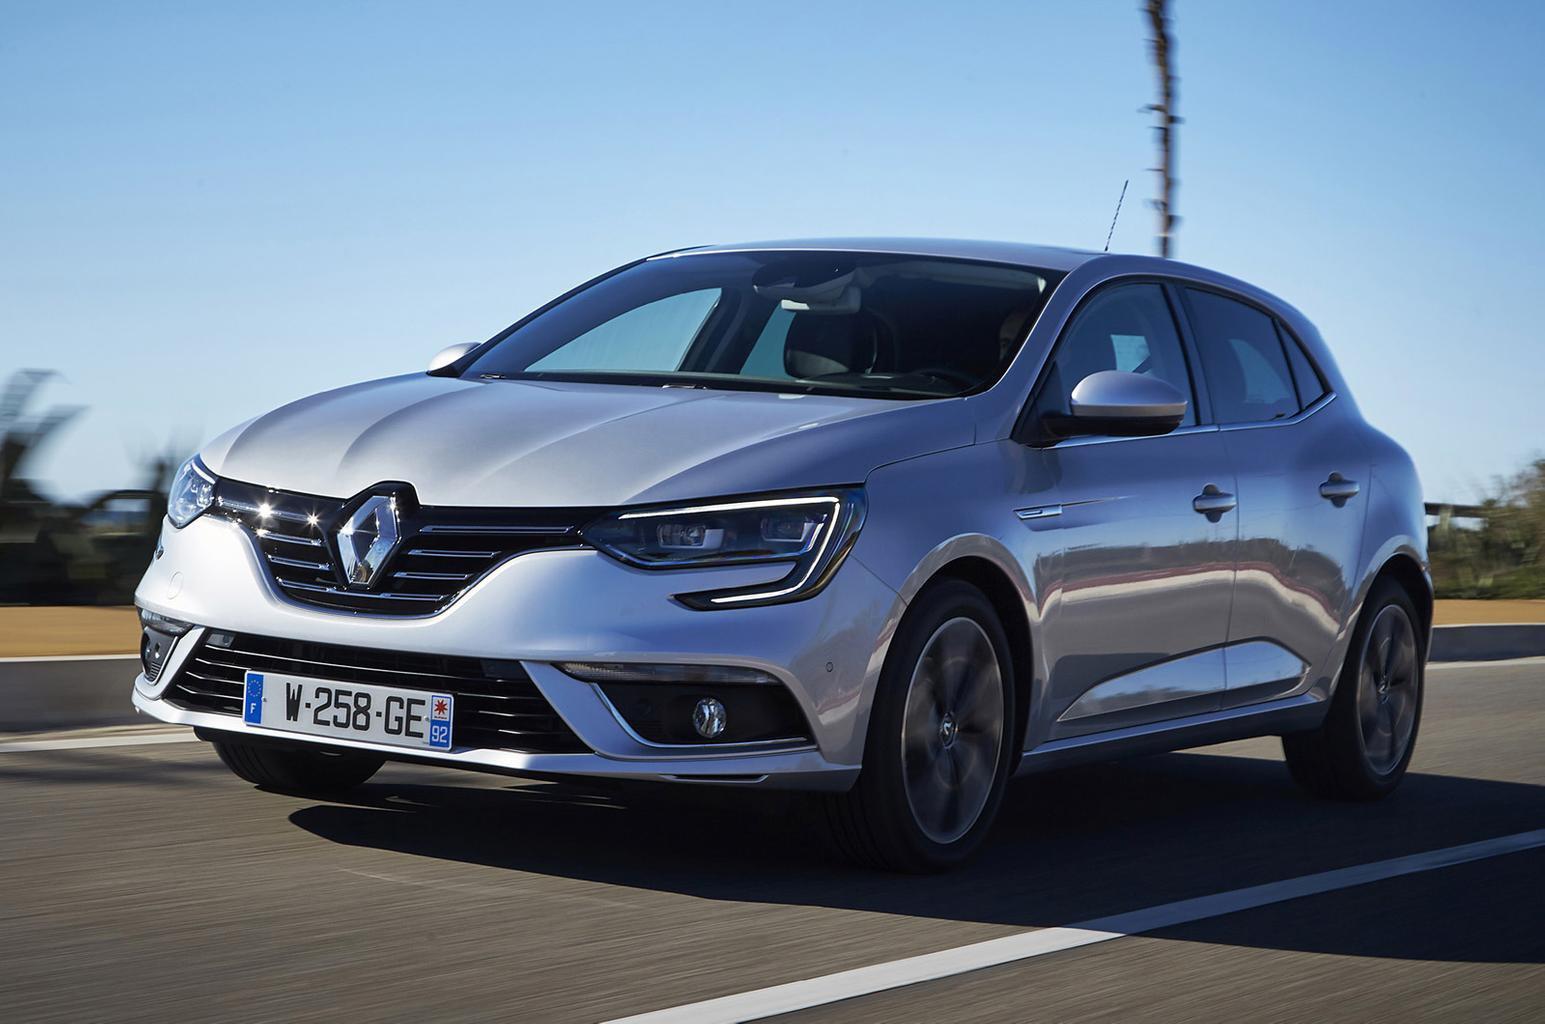 2016 Renault Megane Energy dCi 130 review